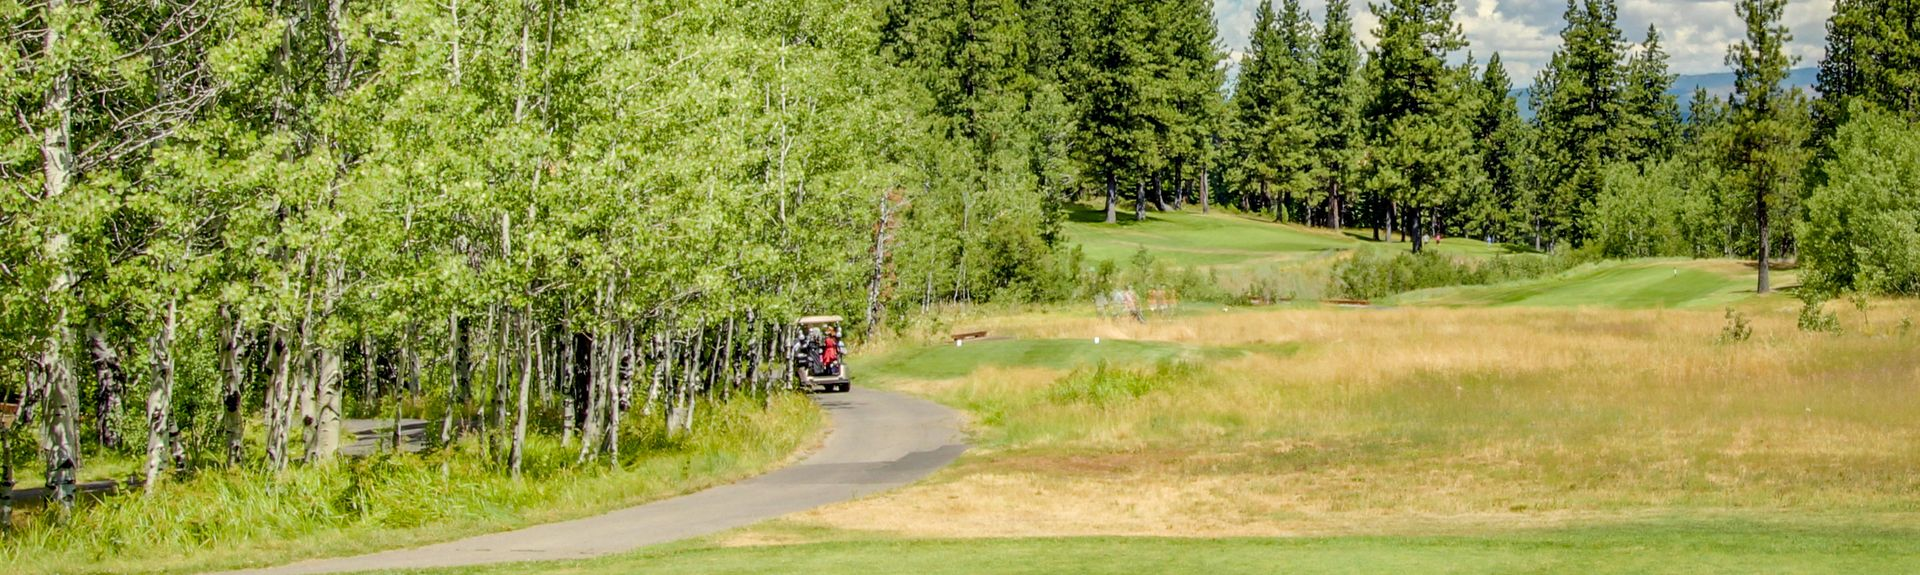 Incline Village Championship Golf Course, Incline Village, Nevada, United States of America